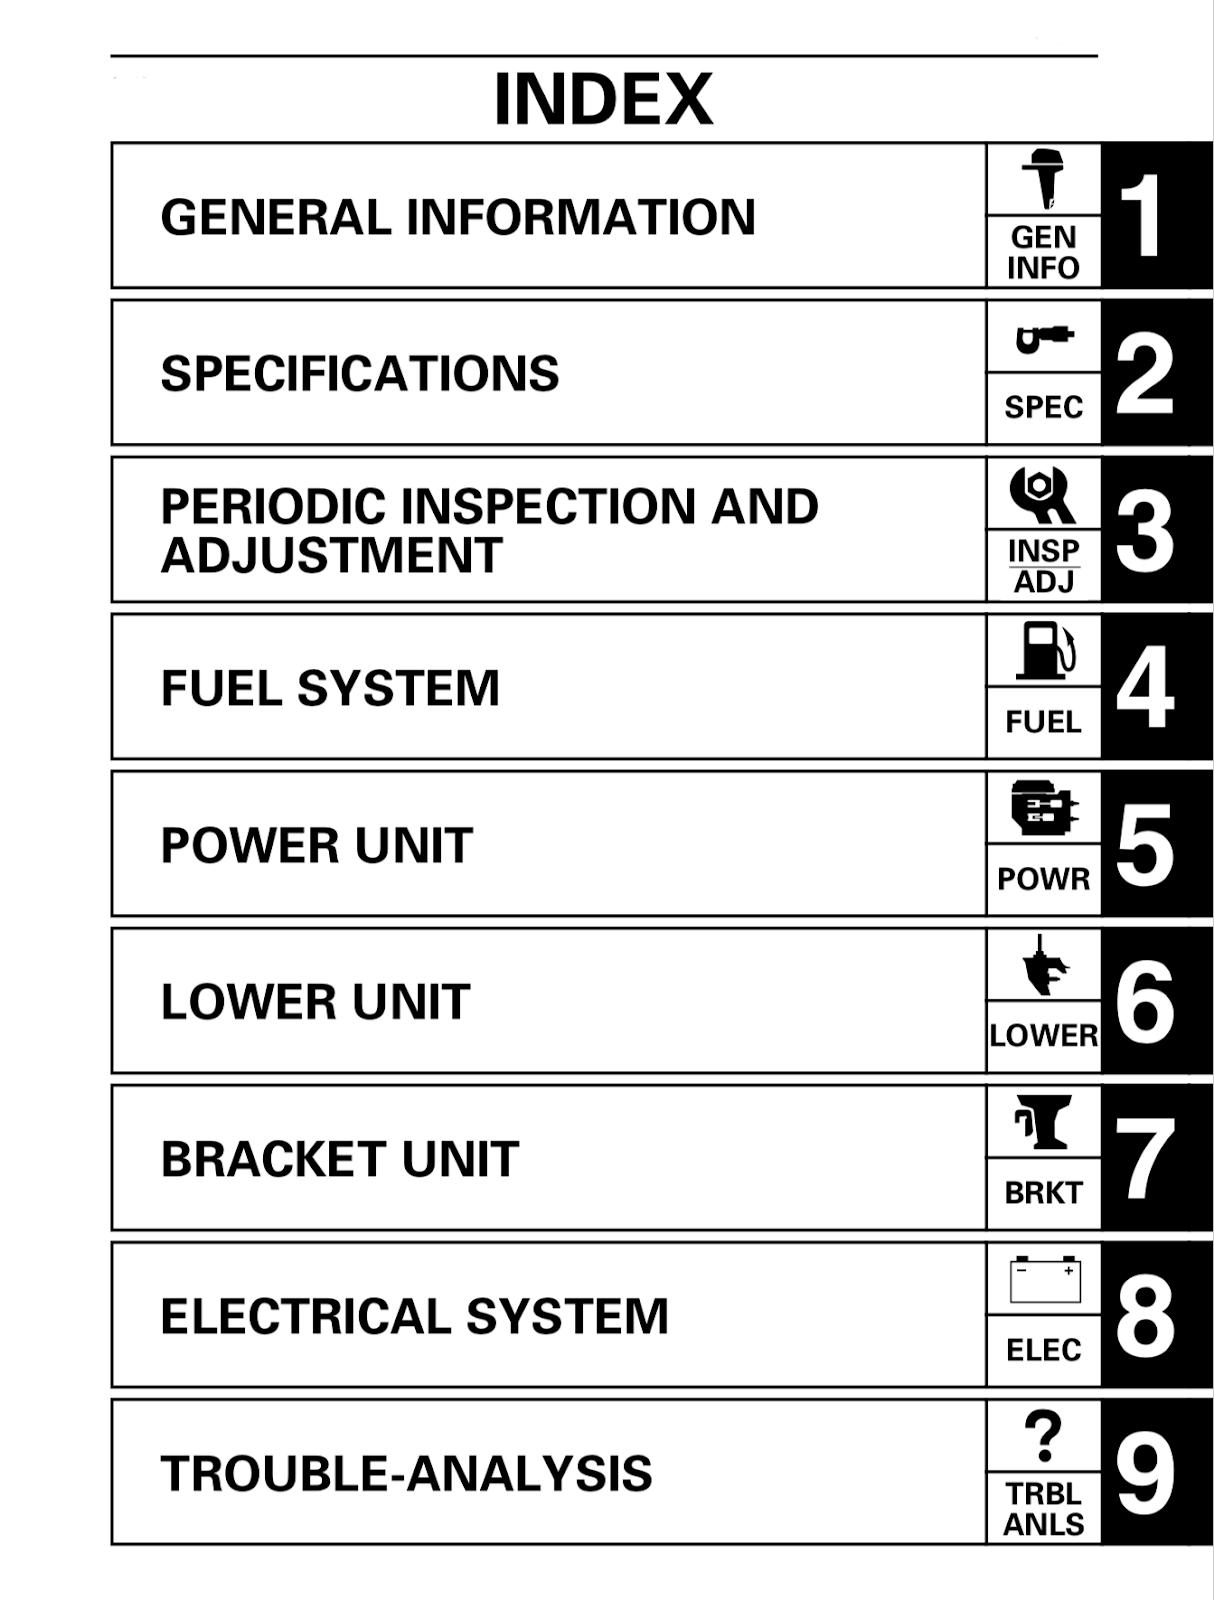 download yamaha 90tlr service manual october 2018 grizzly 660 wiring-diagram yamaha 90tlr wiring diagram #10